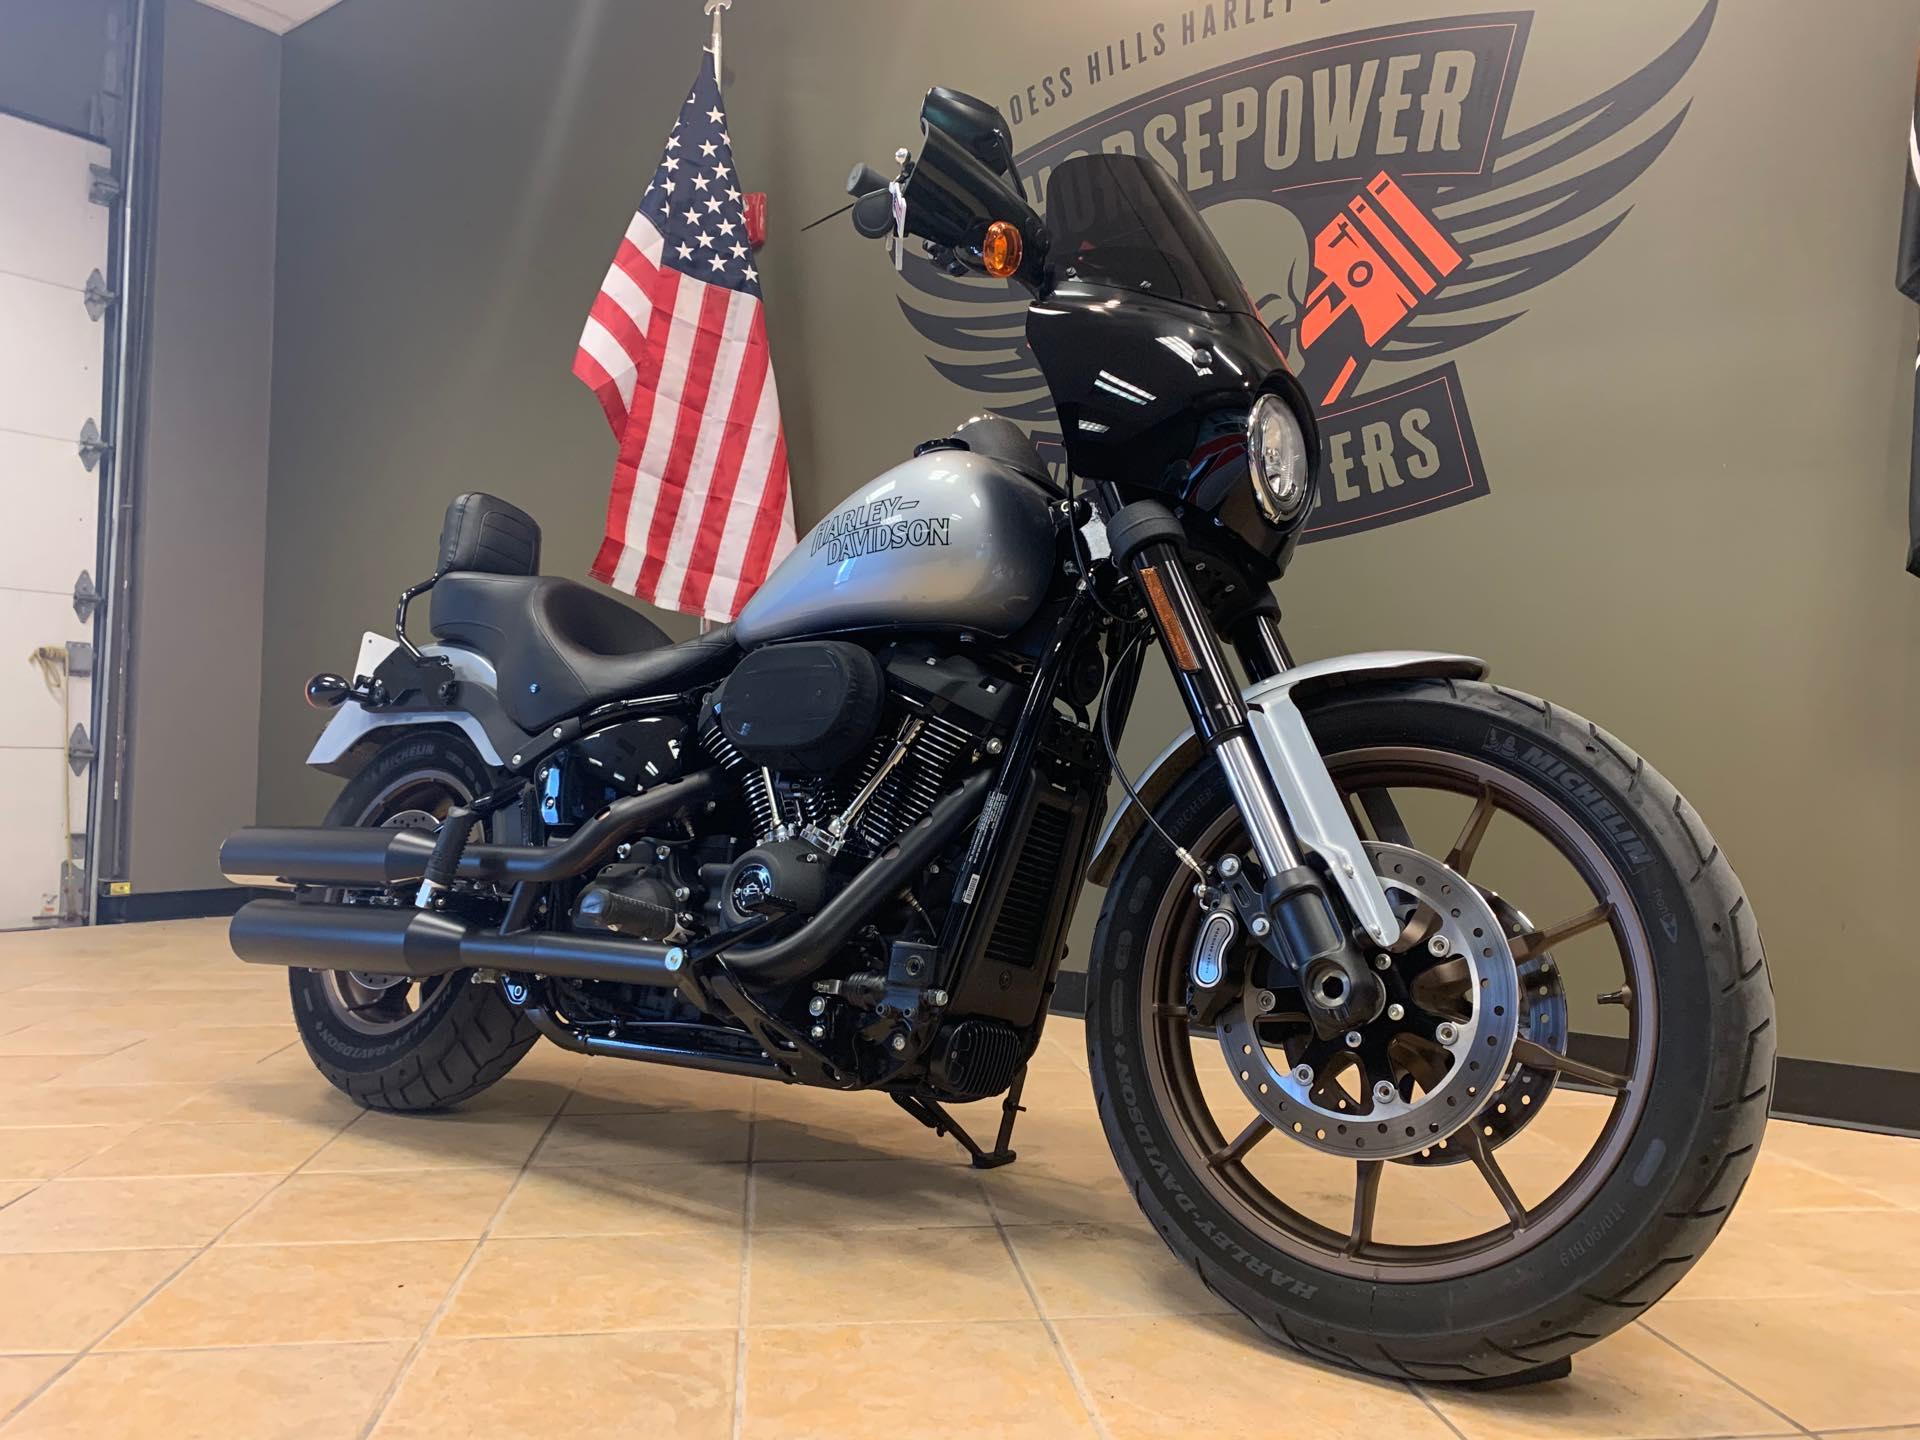 2020 Harley-Davidson Softail Low Rider S at Loess Hills Harley-Davidson